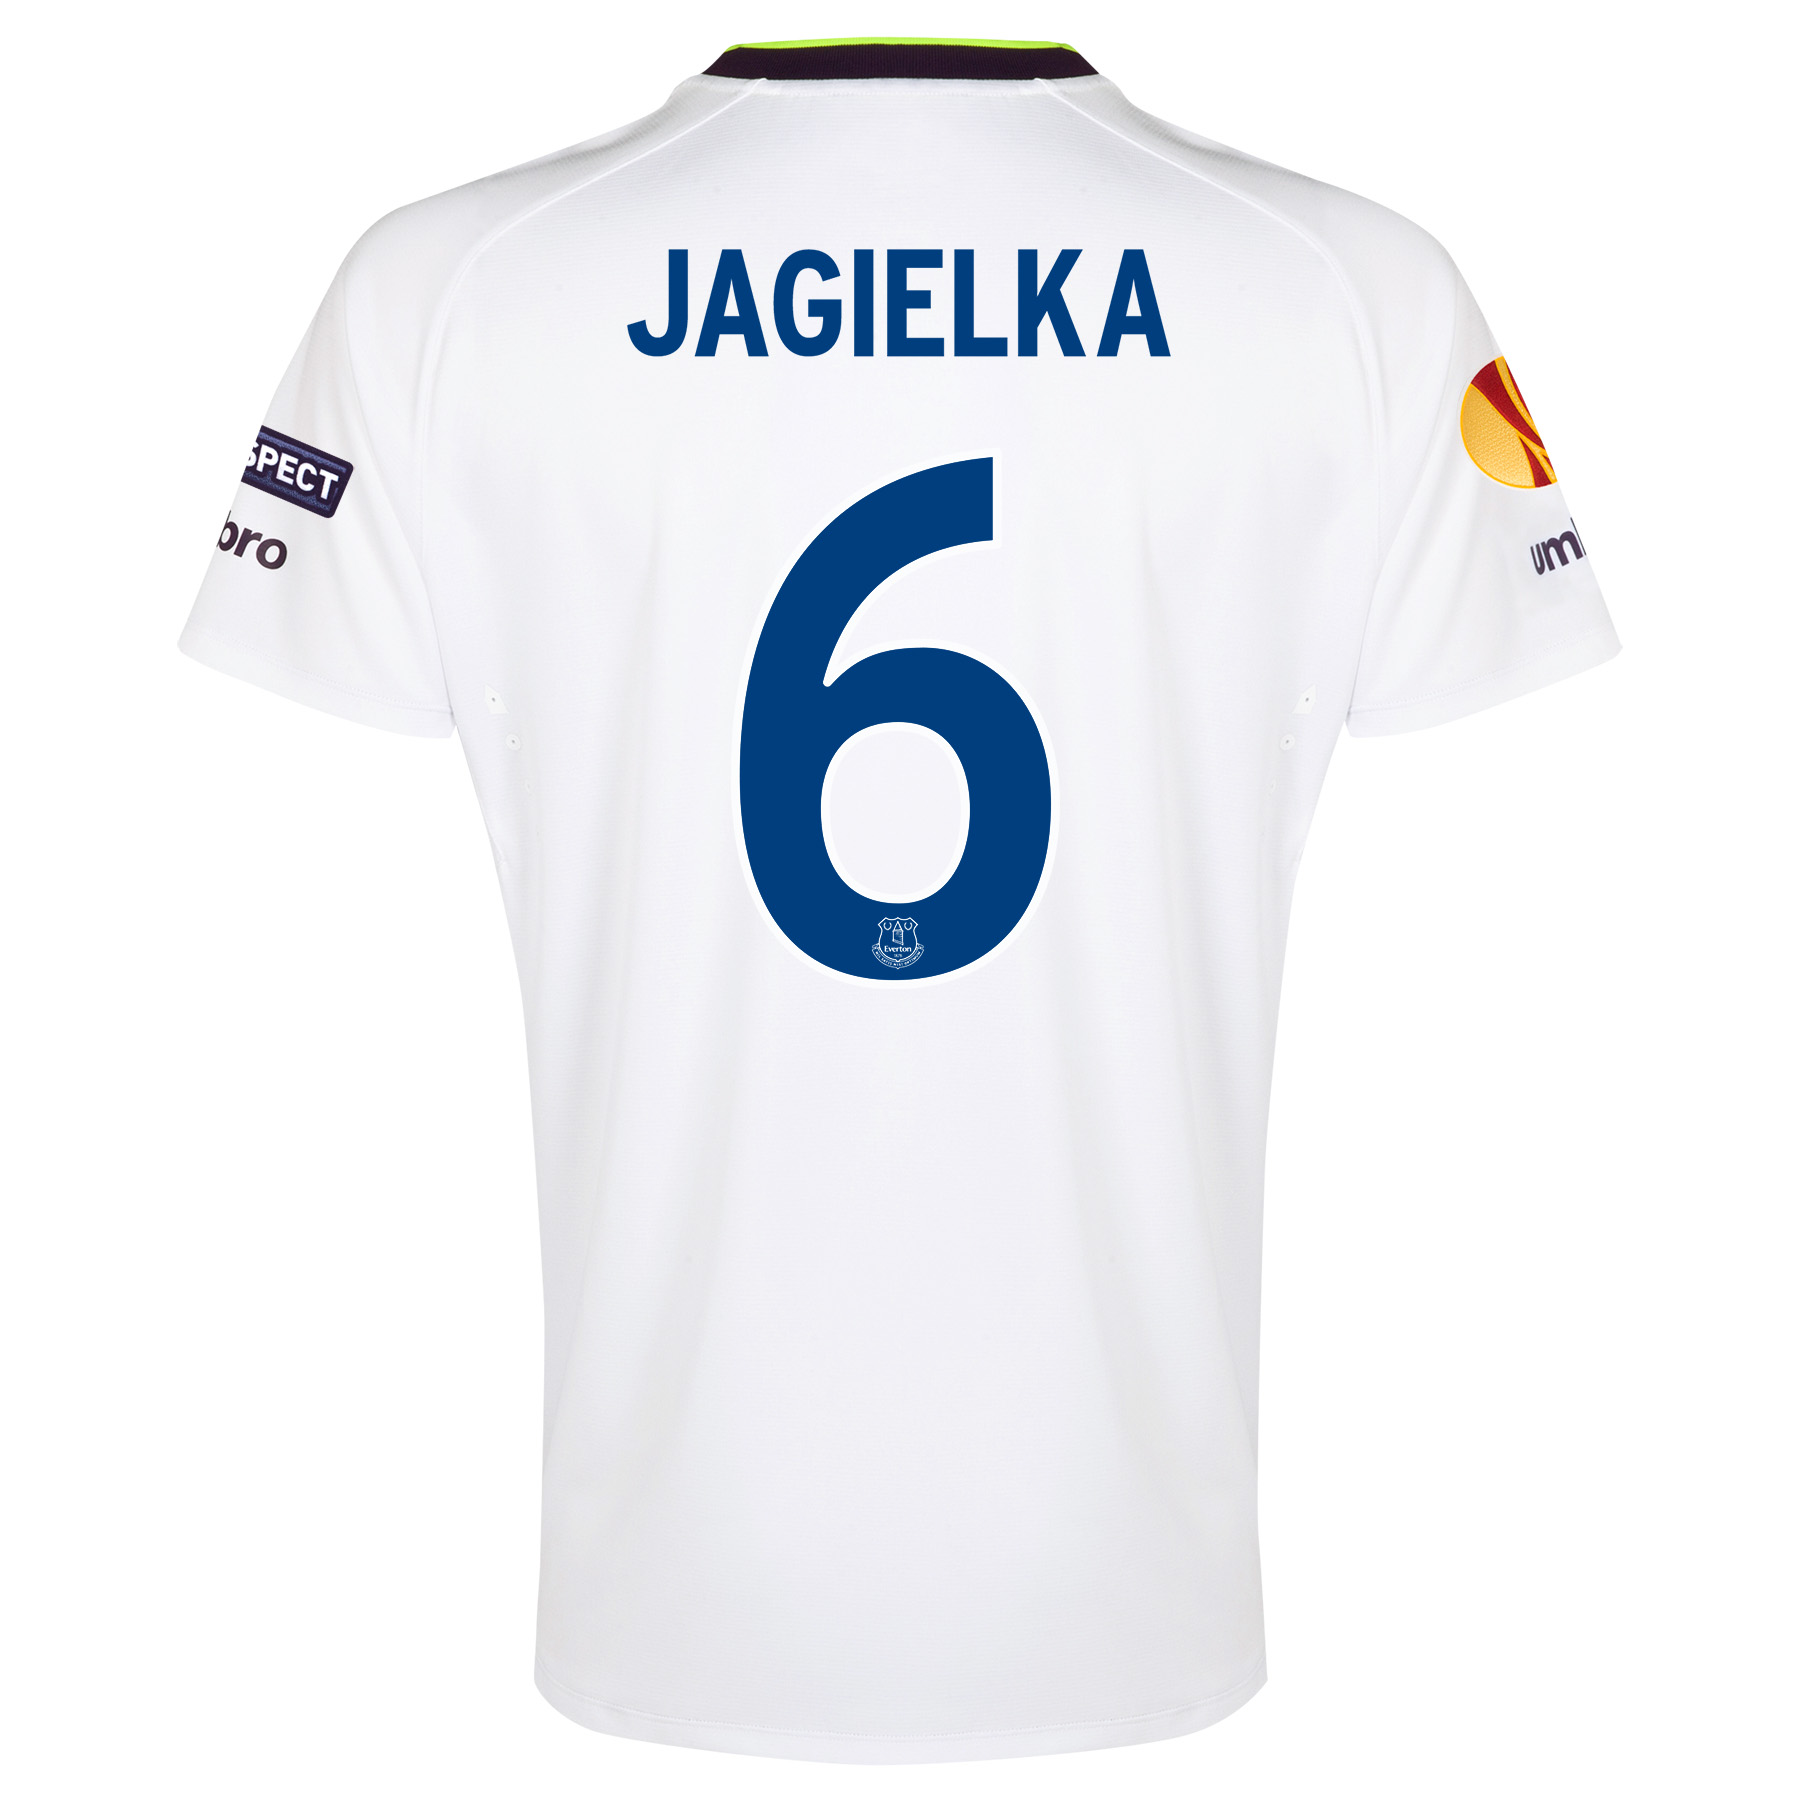 Everton UEFA Europa League 3rd Shirt 2014/15 with Jagielka 6 printing